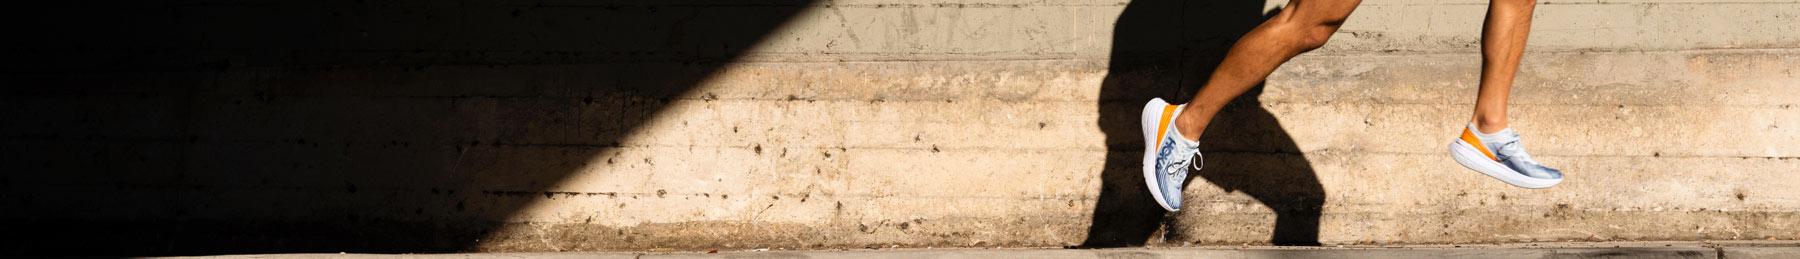 Man running down road by concrete wall wearing HOKA shoes.